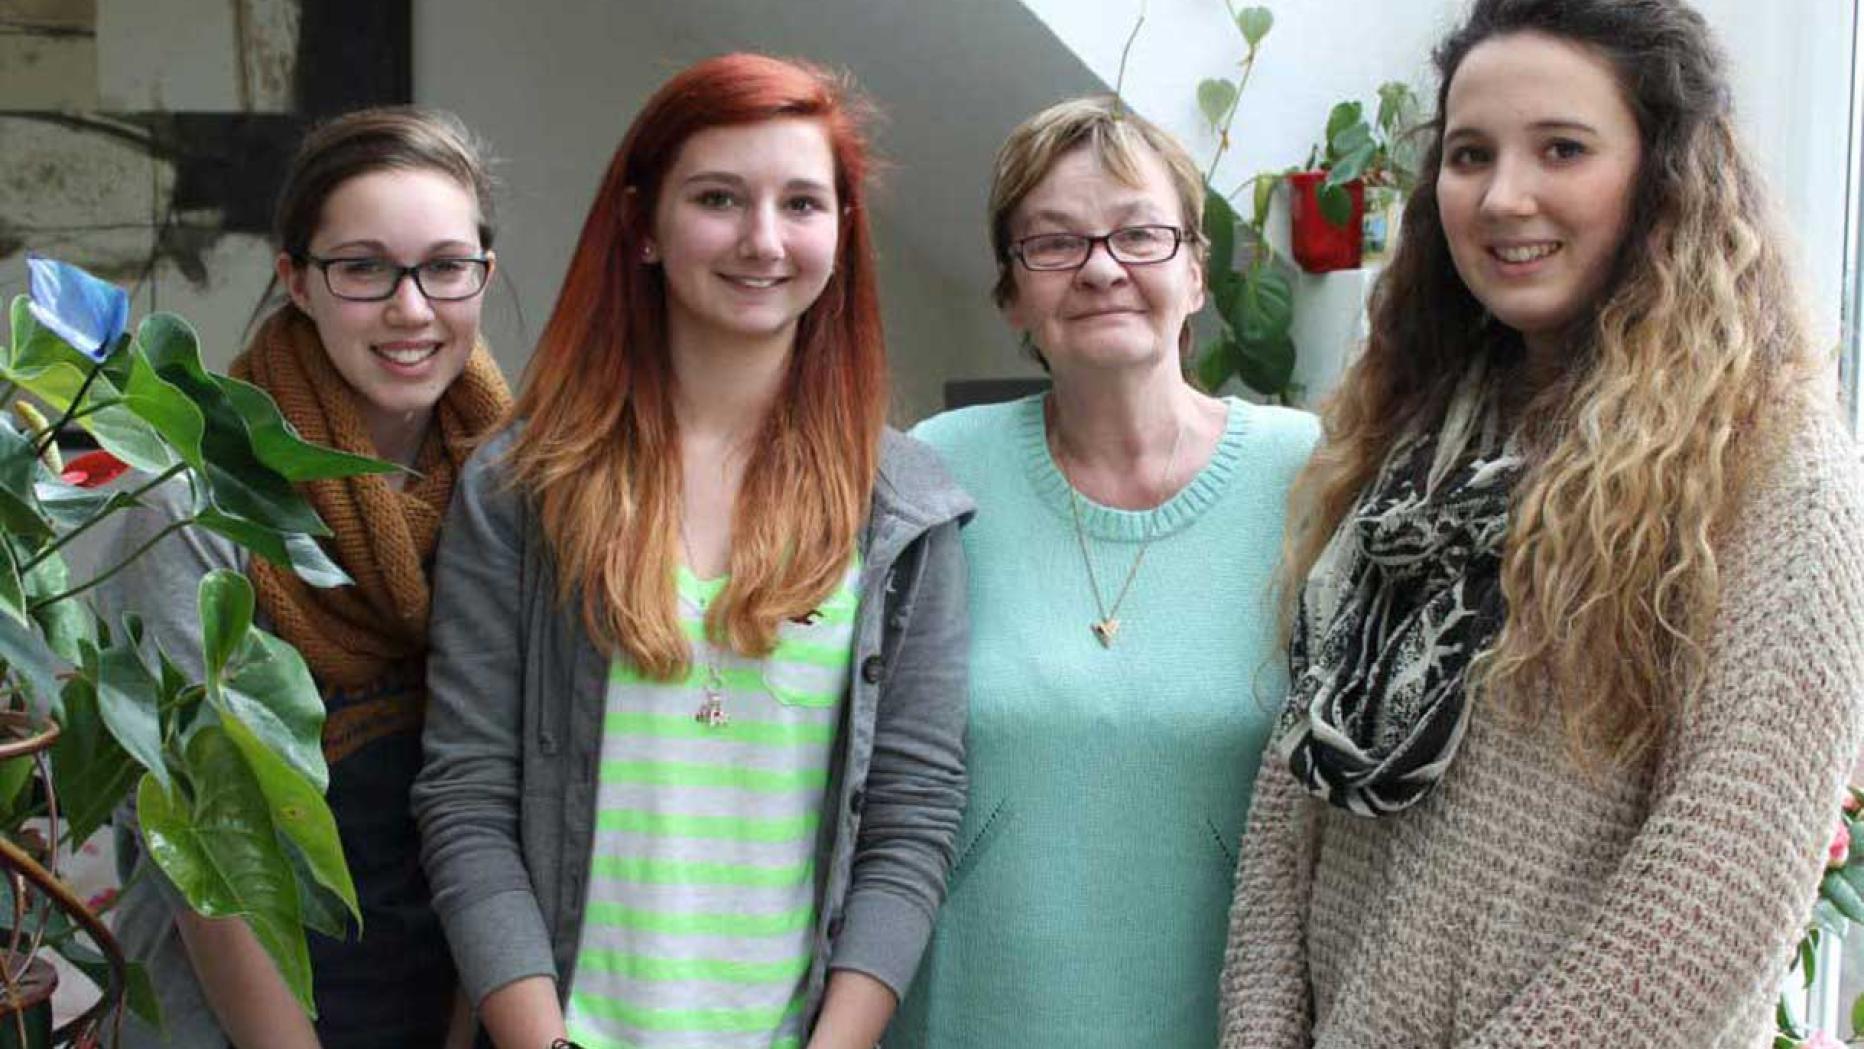 Vcklabruck partnersuche online: Fick treffen in Ahrensburg